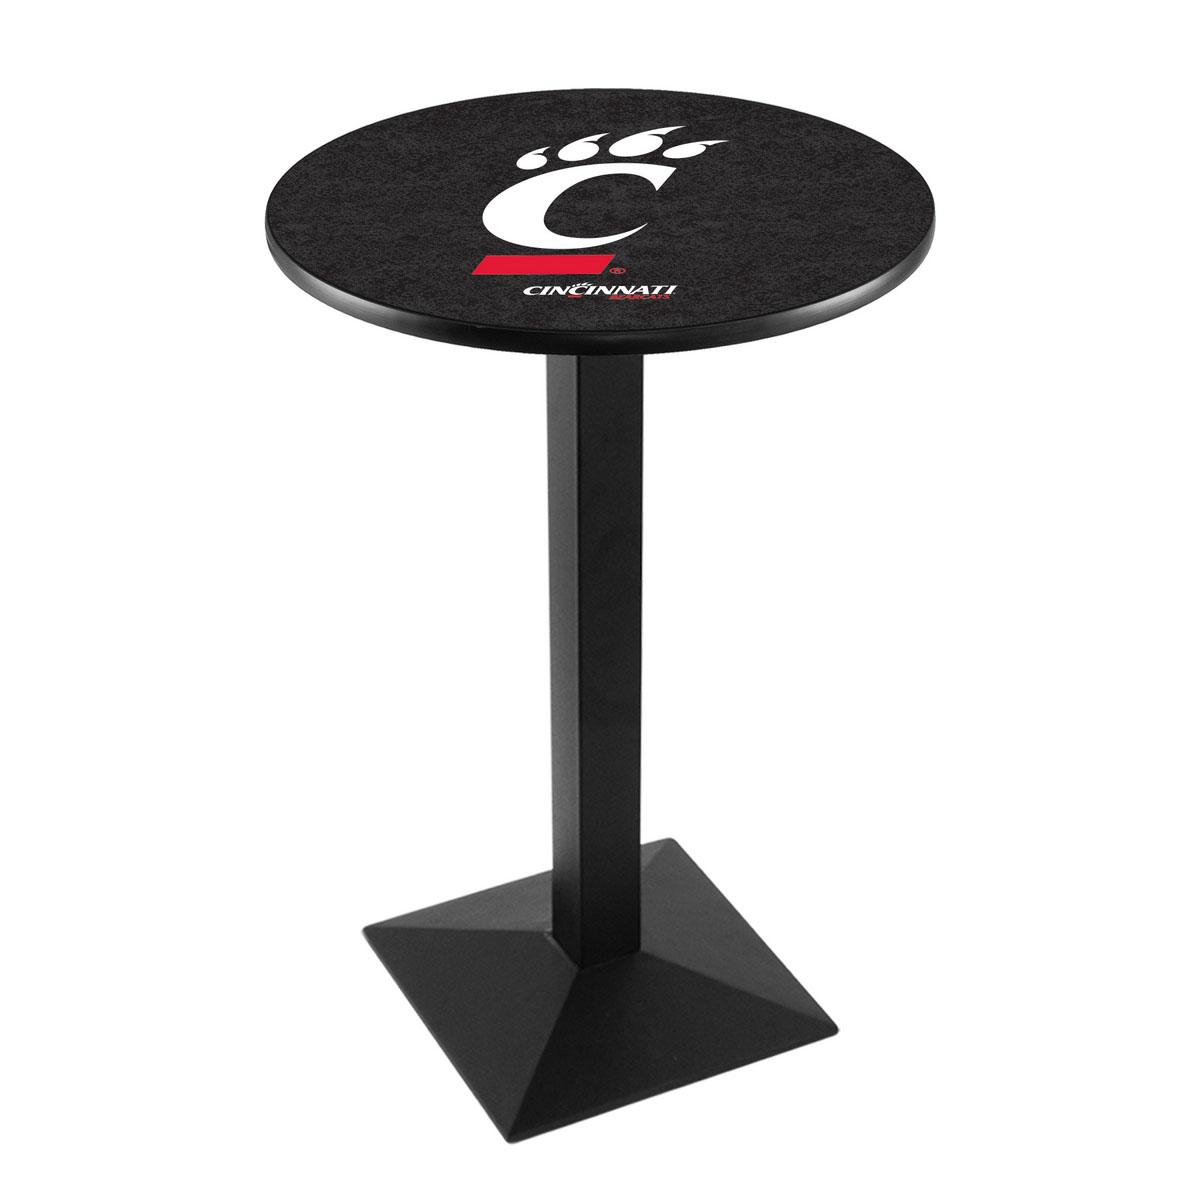 Choose University Cincinnati Logo Pub Bar Table Square Stand Product Photo